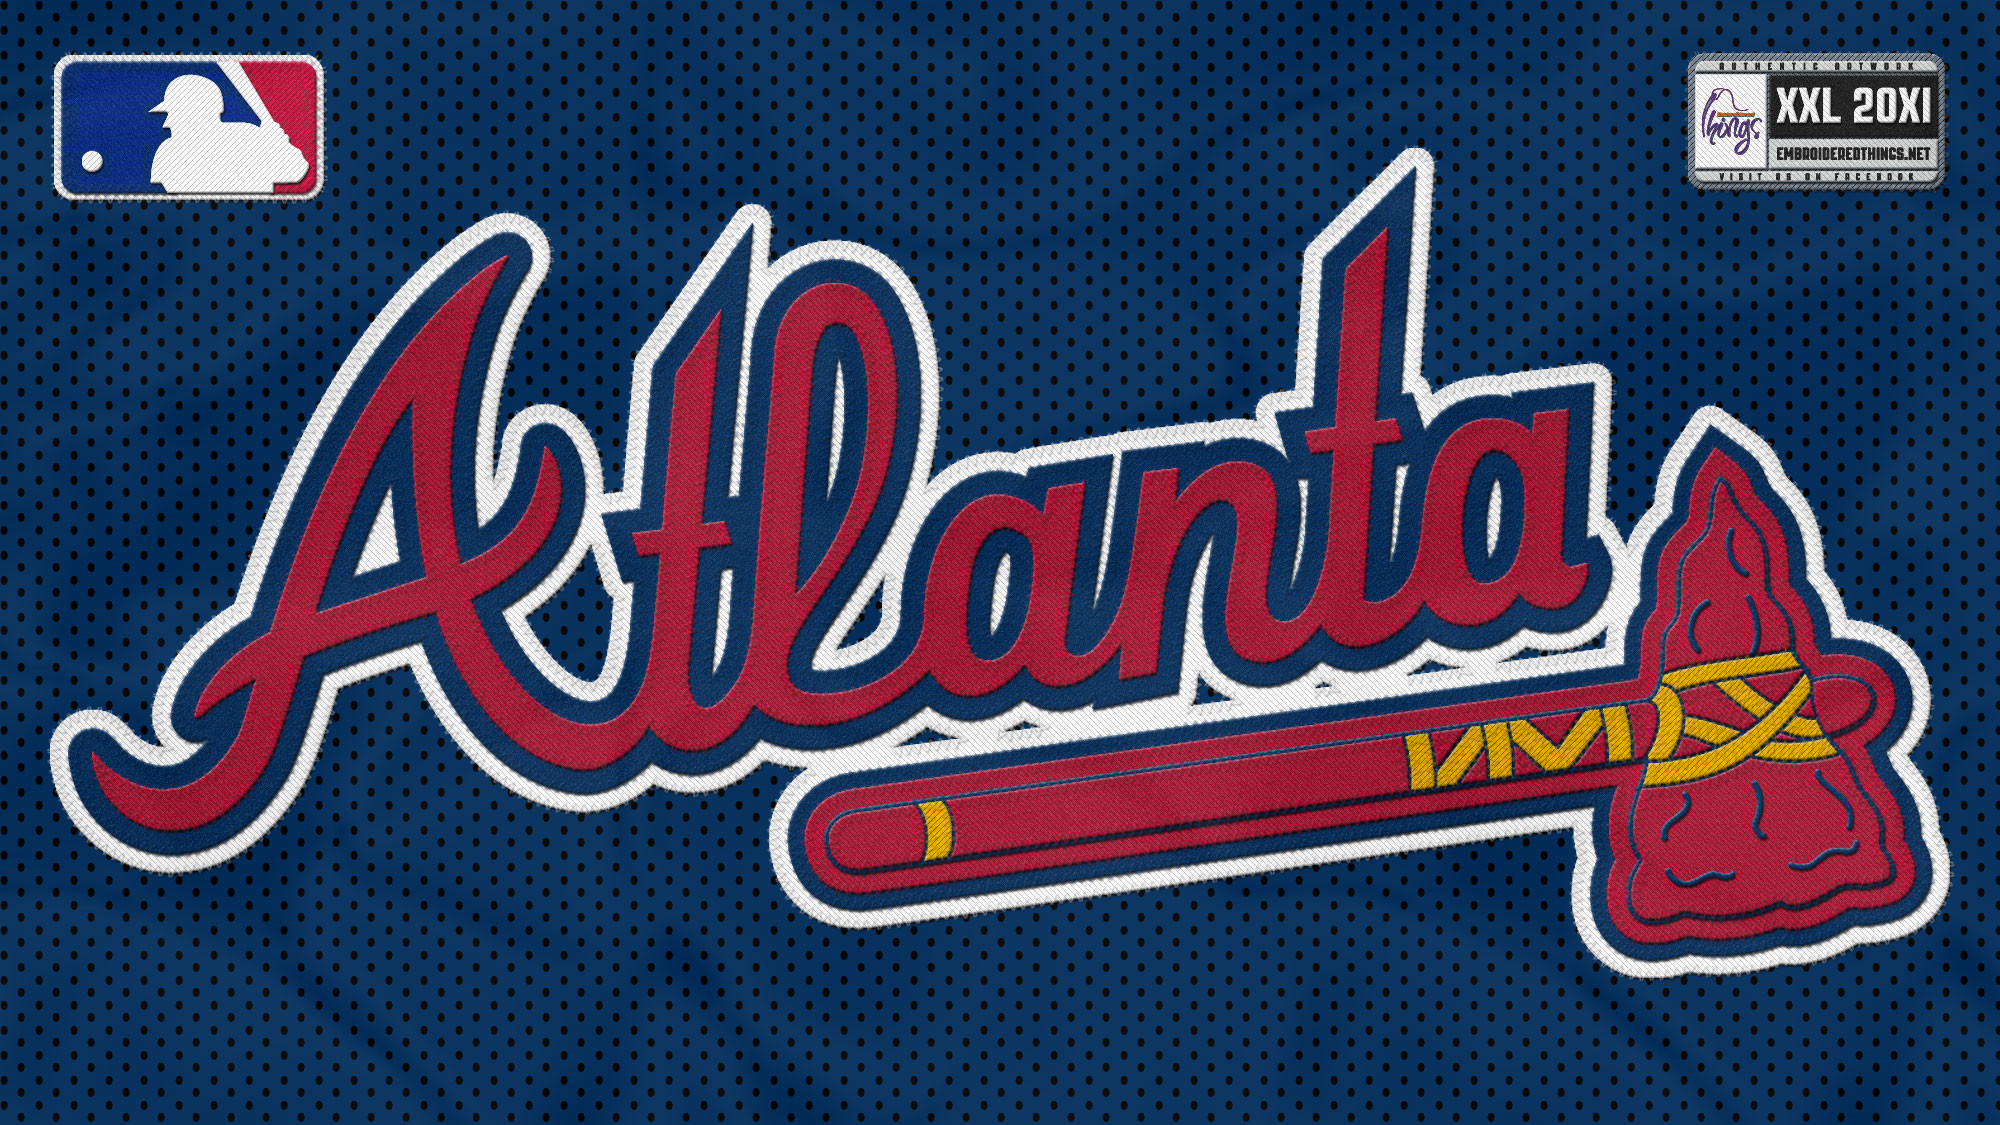 Braves Mobile – Fan Forum – Wallpapers | Atlanta Braves | Adorable  Wallpapers | Pinterest | Wallpaper